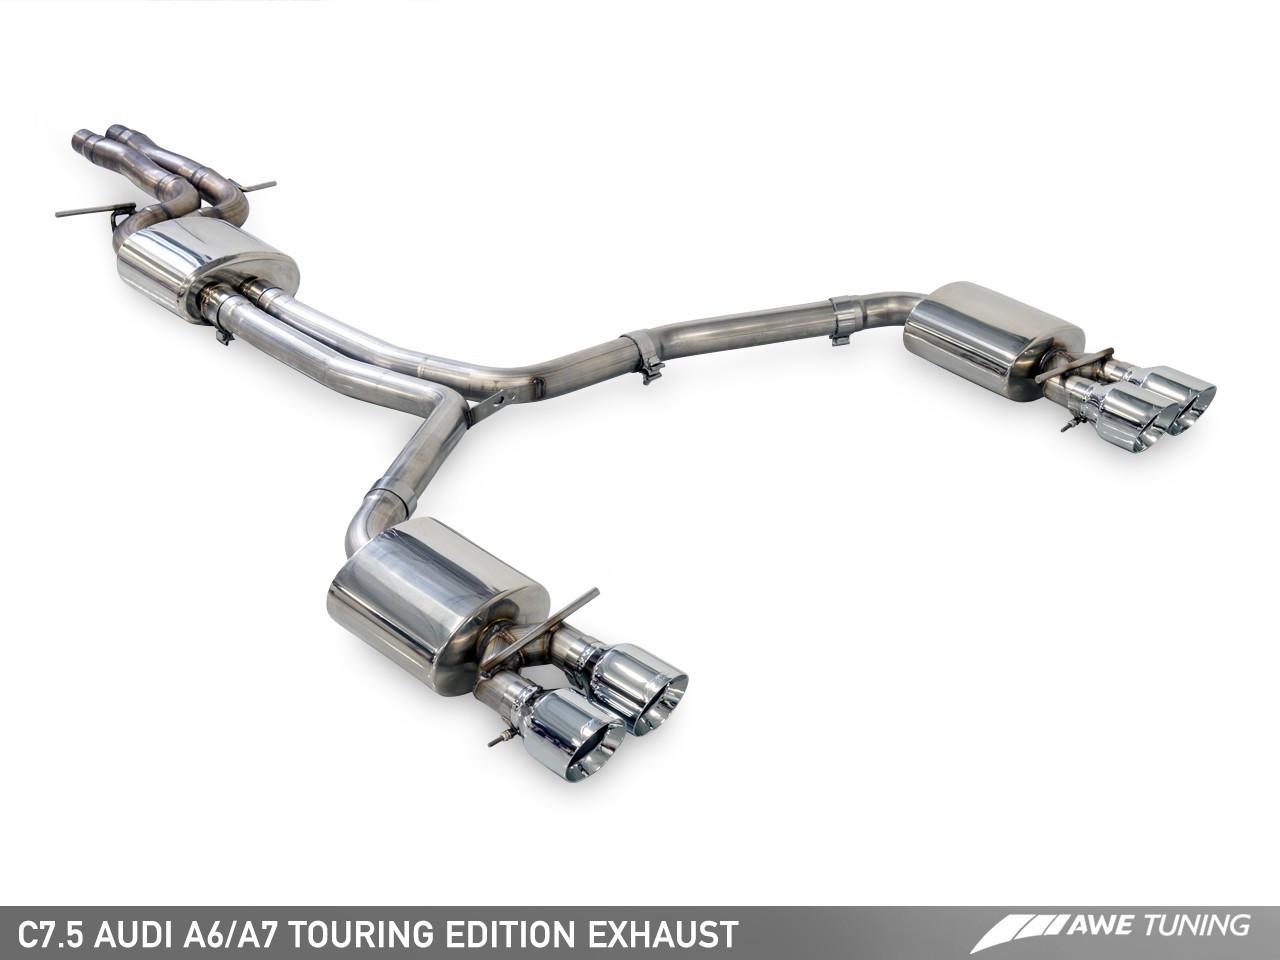 Awe Tuning Audi A7 C7 5 3 0tfsi Touring Edition Exhaust System Awe Tuning Europe